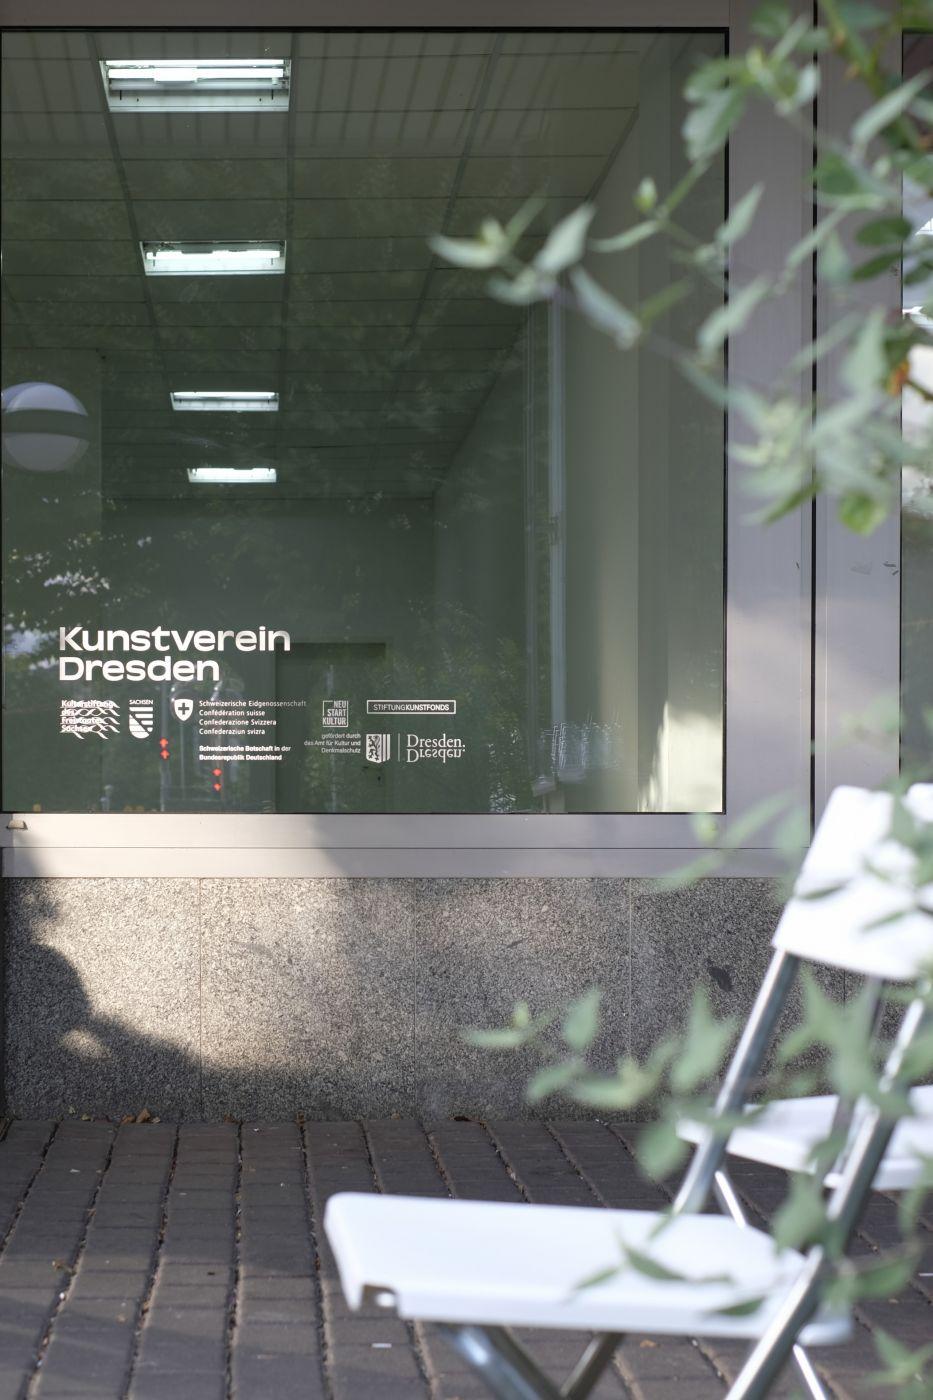 Characters to be reactivated, Kunstverein Dresden